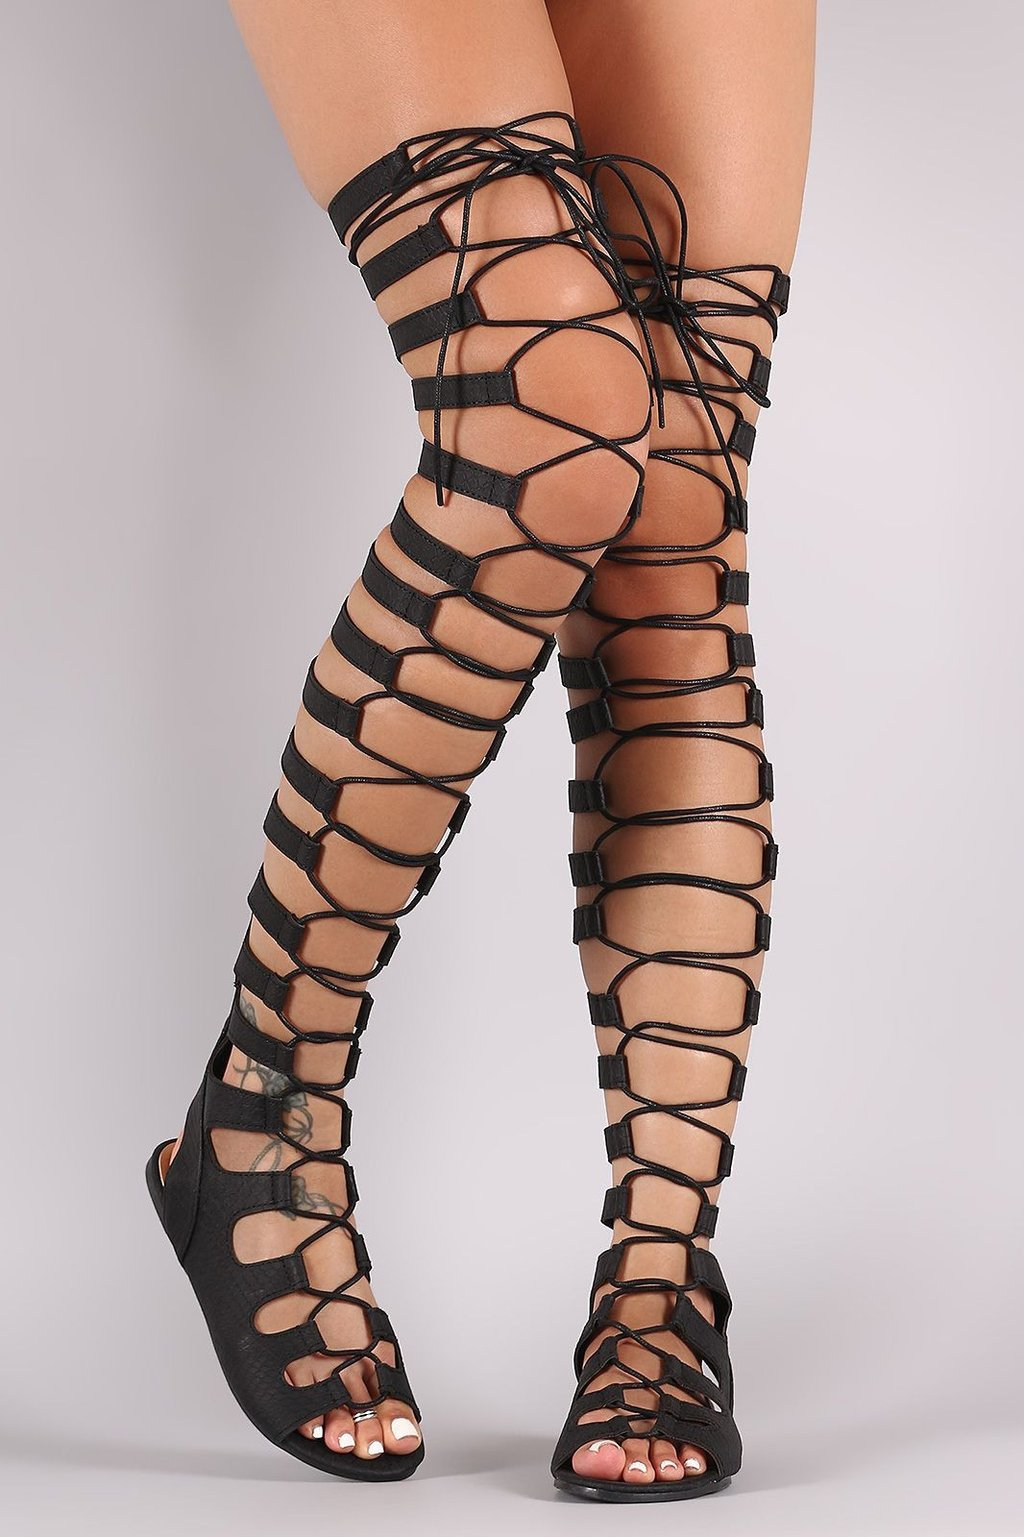 Lace Up Gladiator Sandals Craftysandals Com